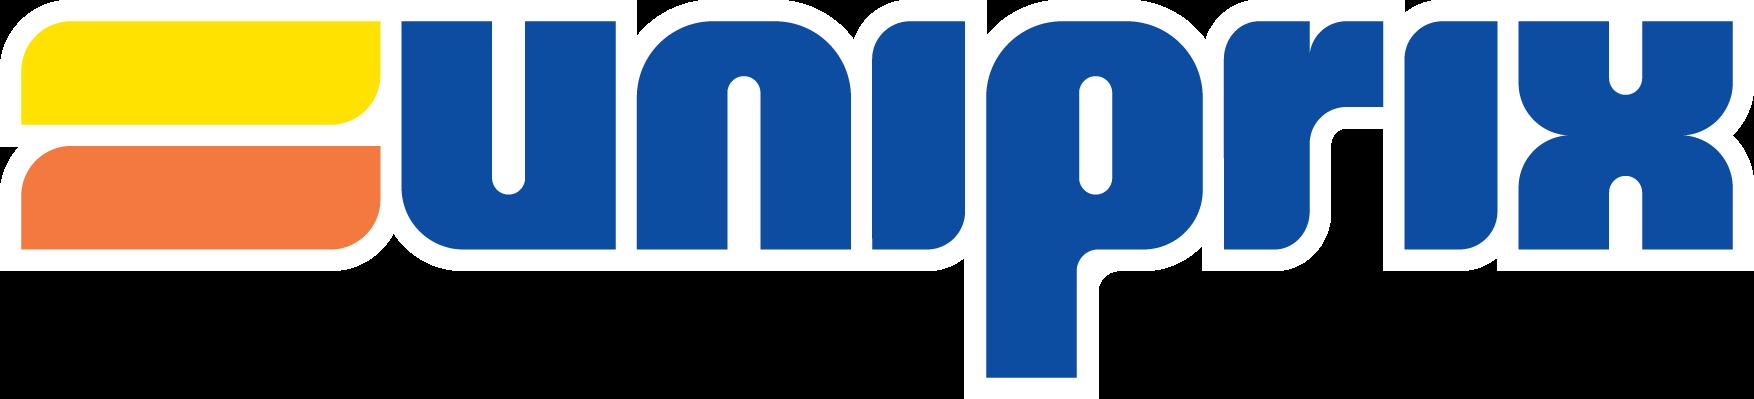 Uniprix, I. Gourdes & D. Messier pharmaciens